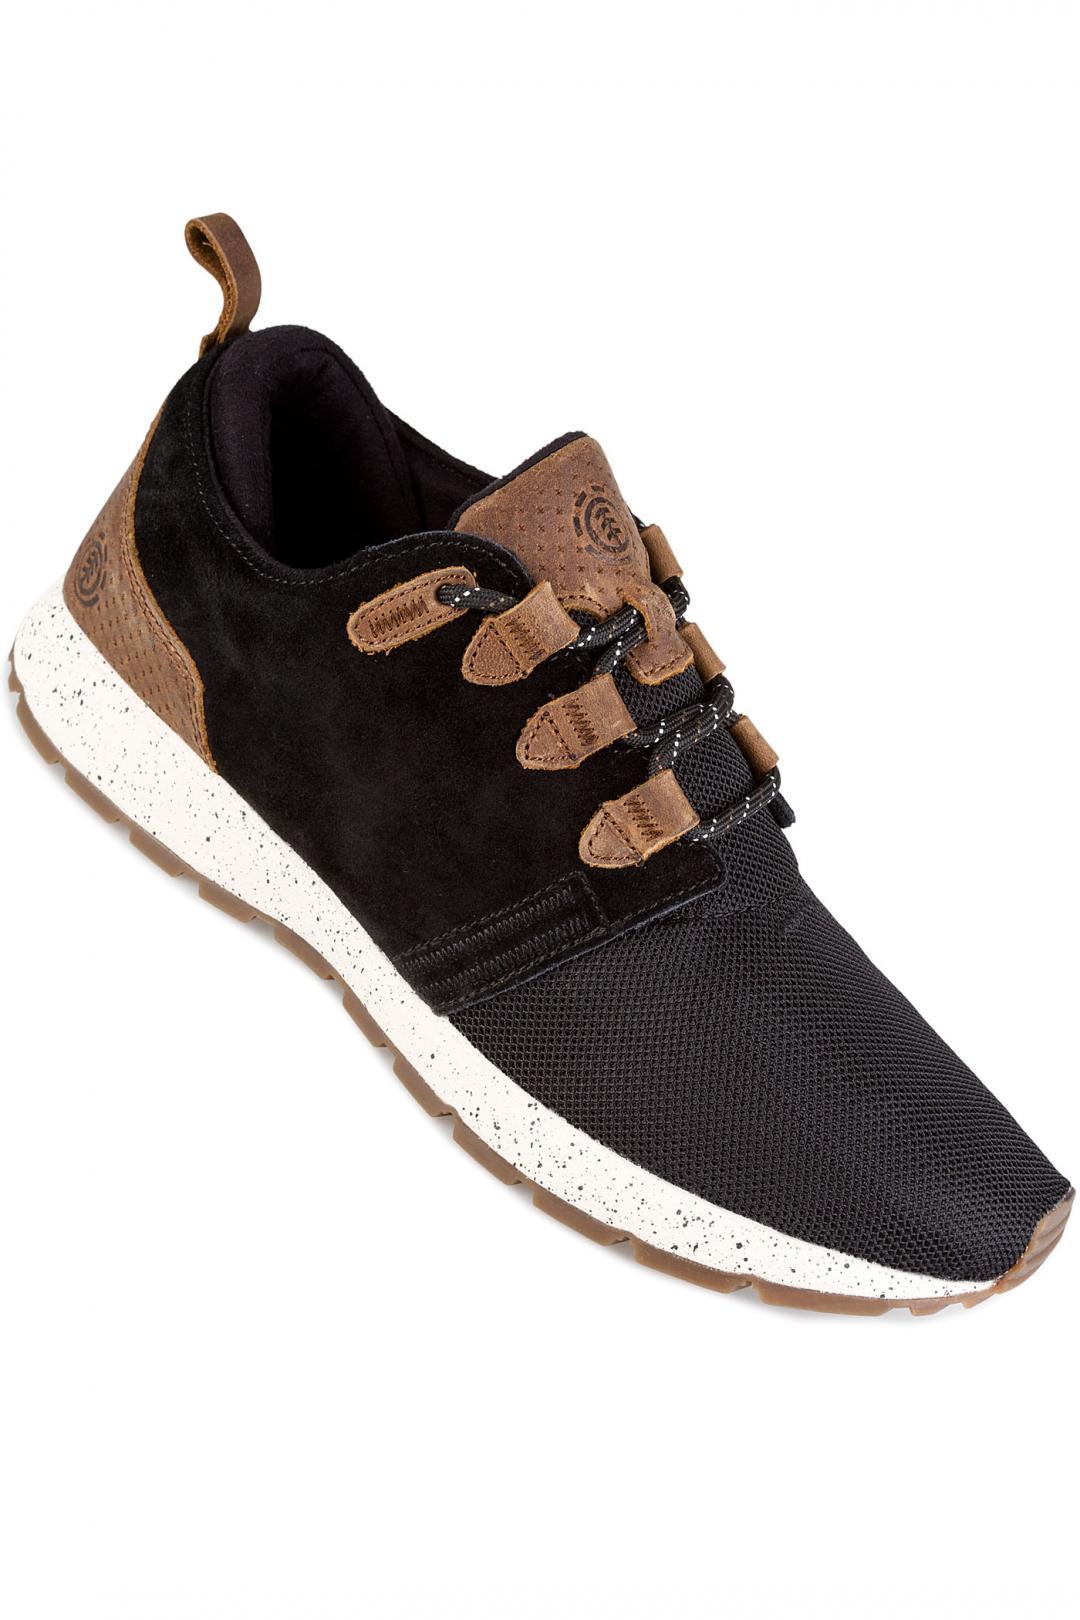 Uomo Element Mitake black taupe | Sneakers low top